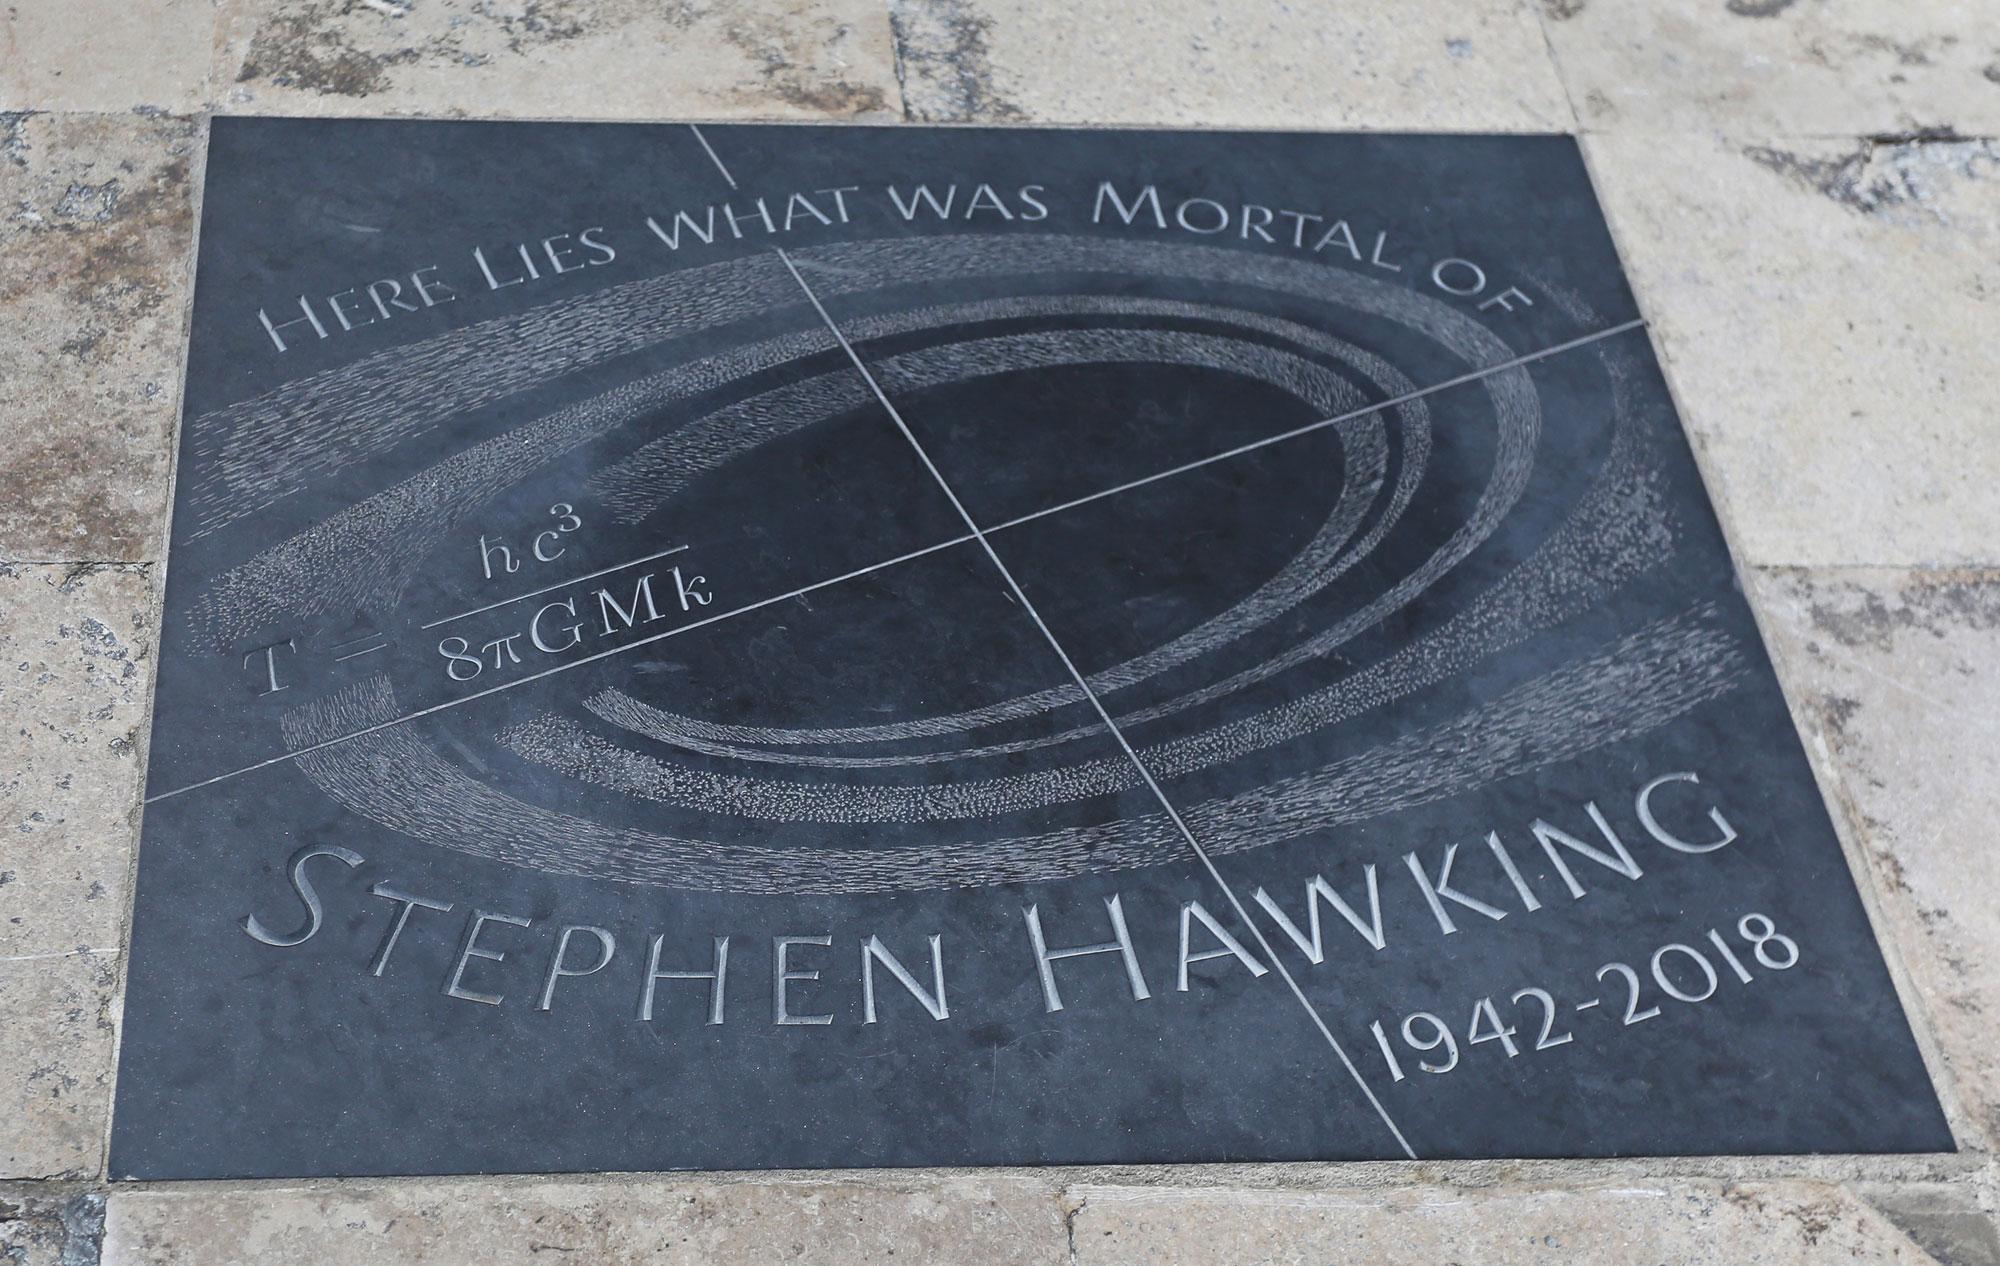 Professor Stephen Hawking Memorial